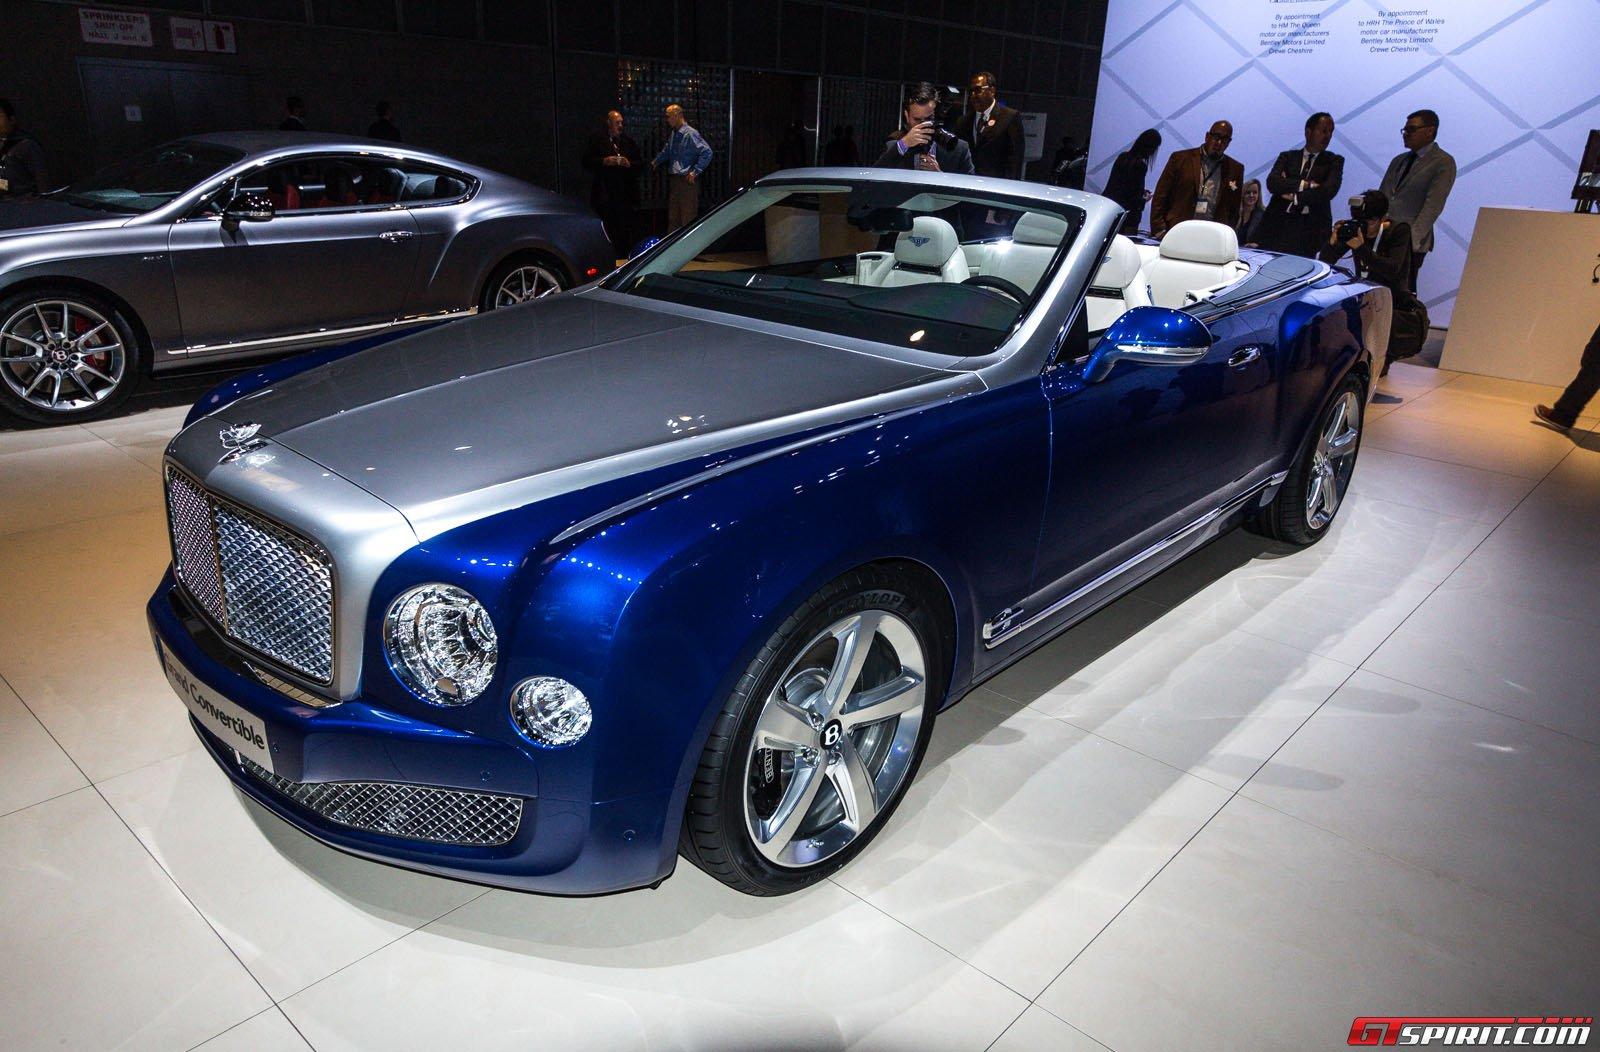 2014 Bentley Grand Convertible (50 Images) - HD Car Wallpaper